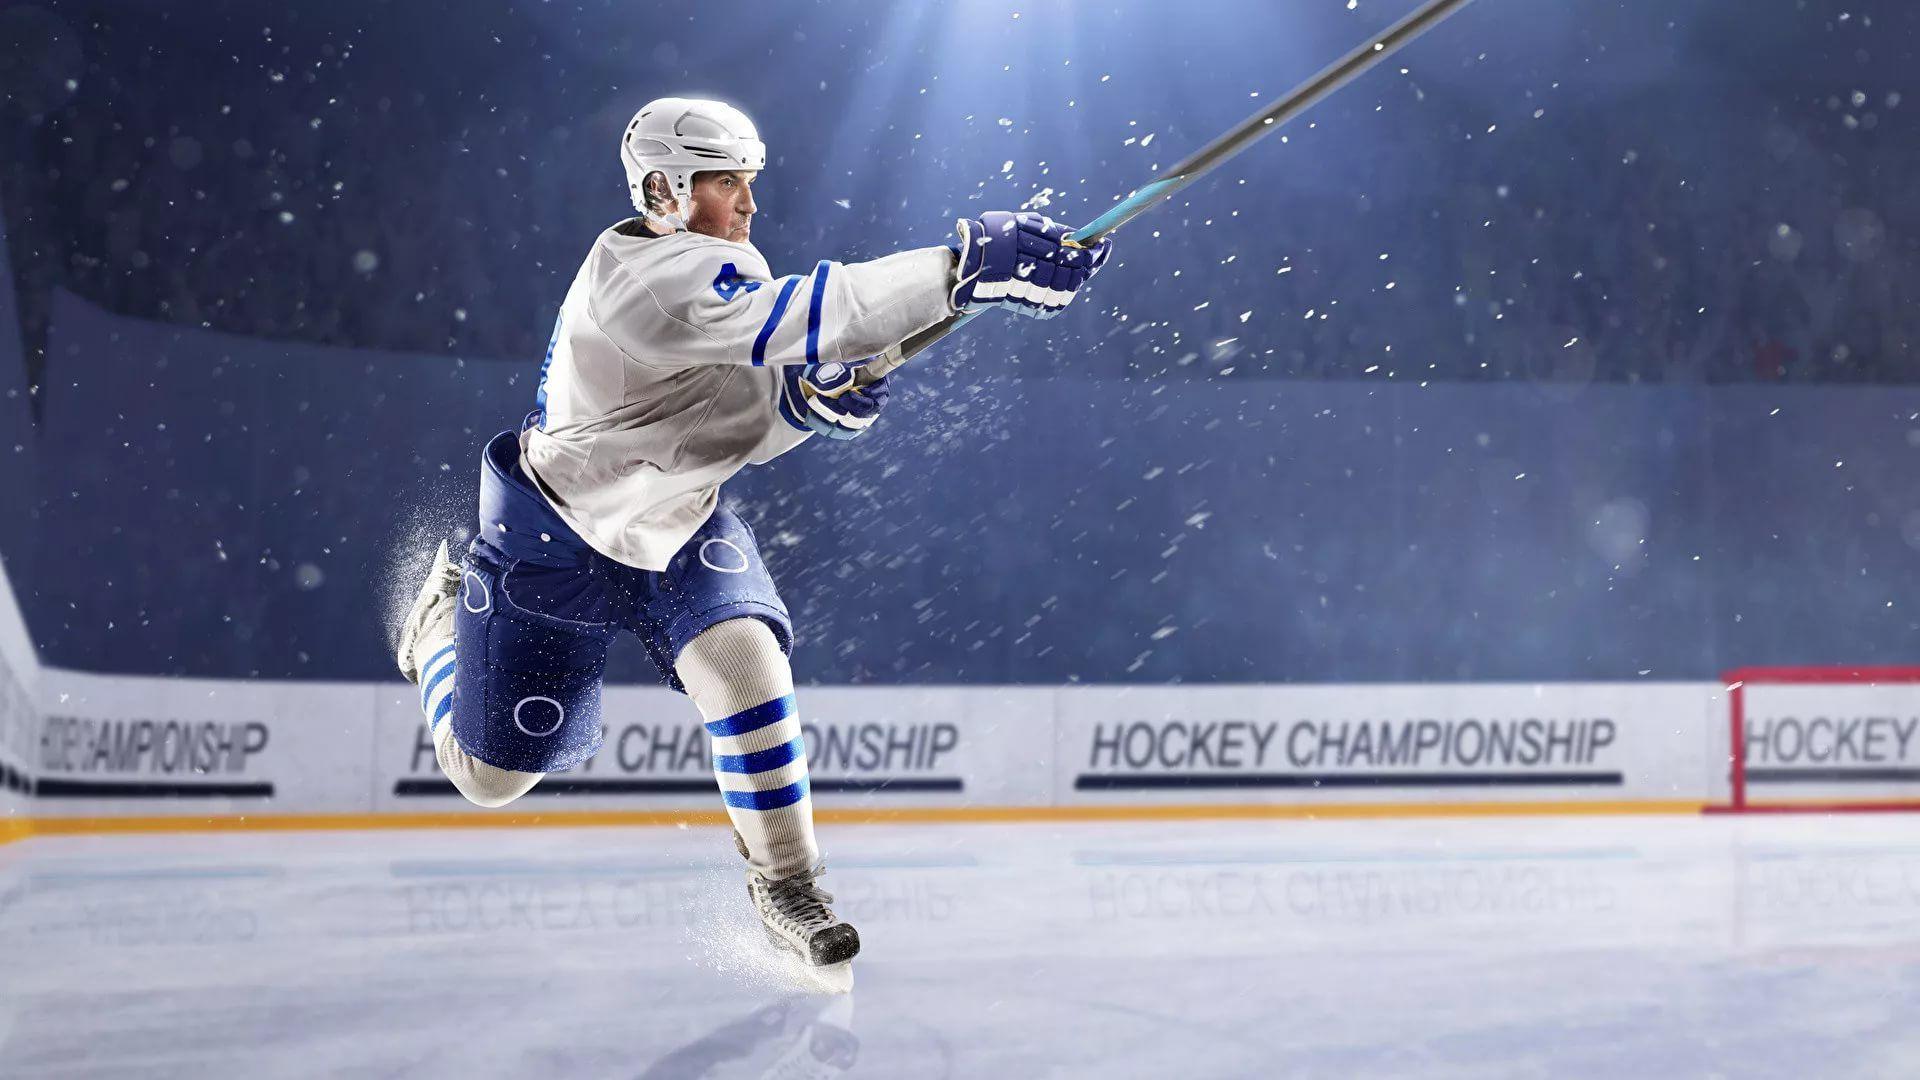 Ice Hockey Free Desktop Wallpaper